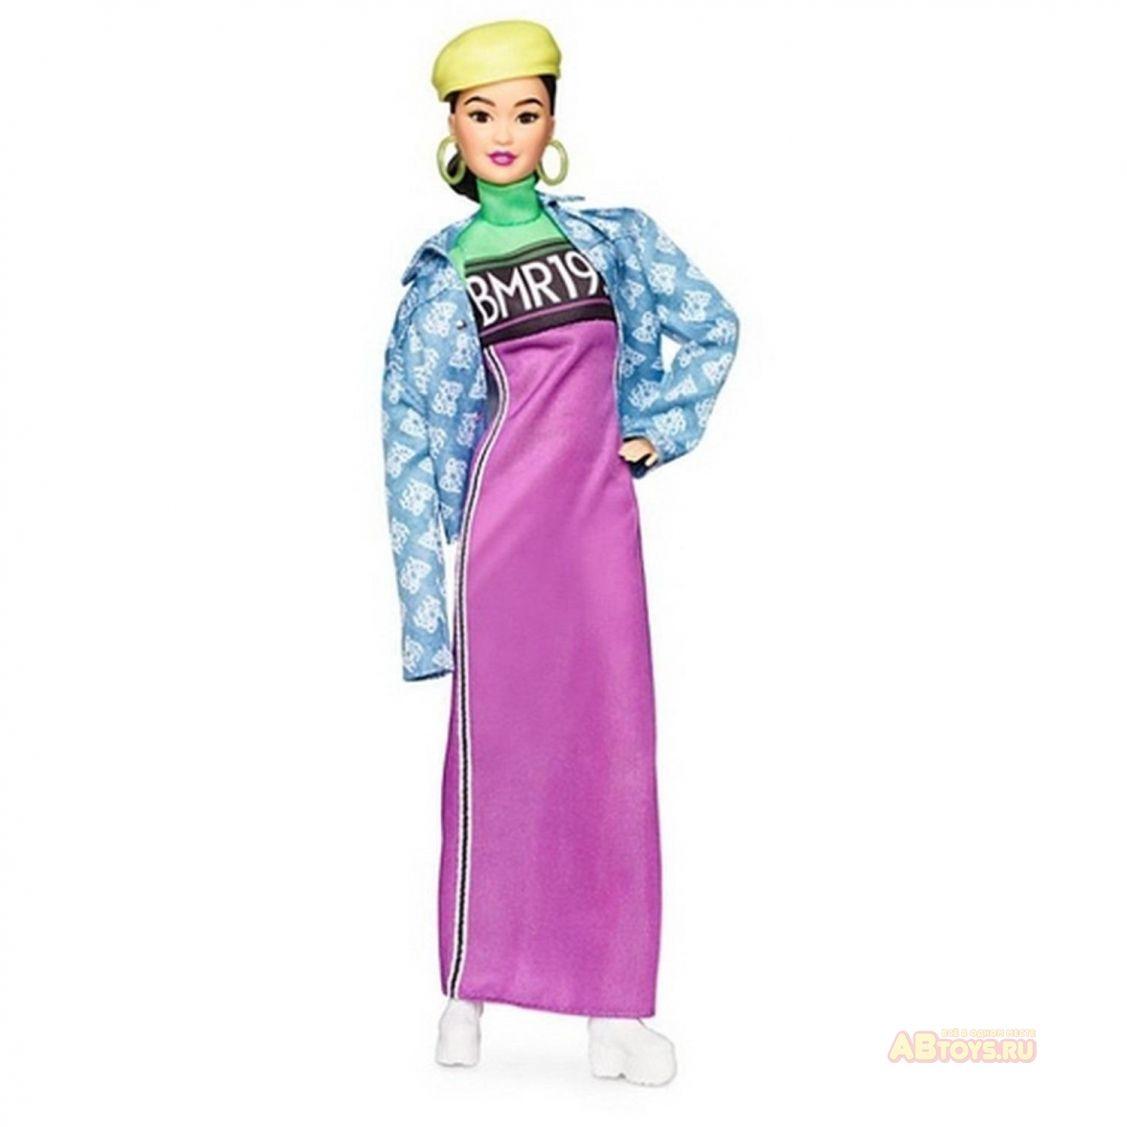 Кукла Barbie - BMR1959